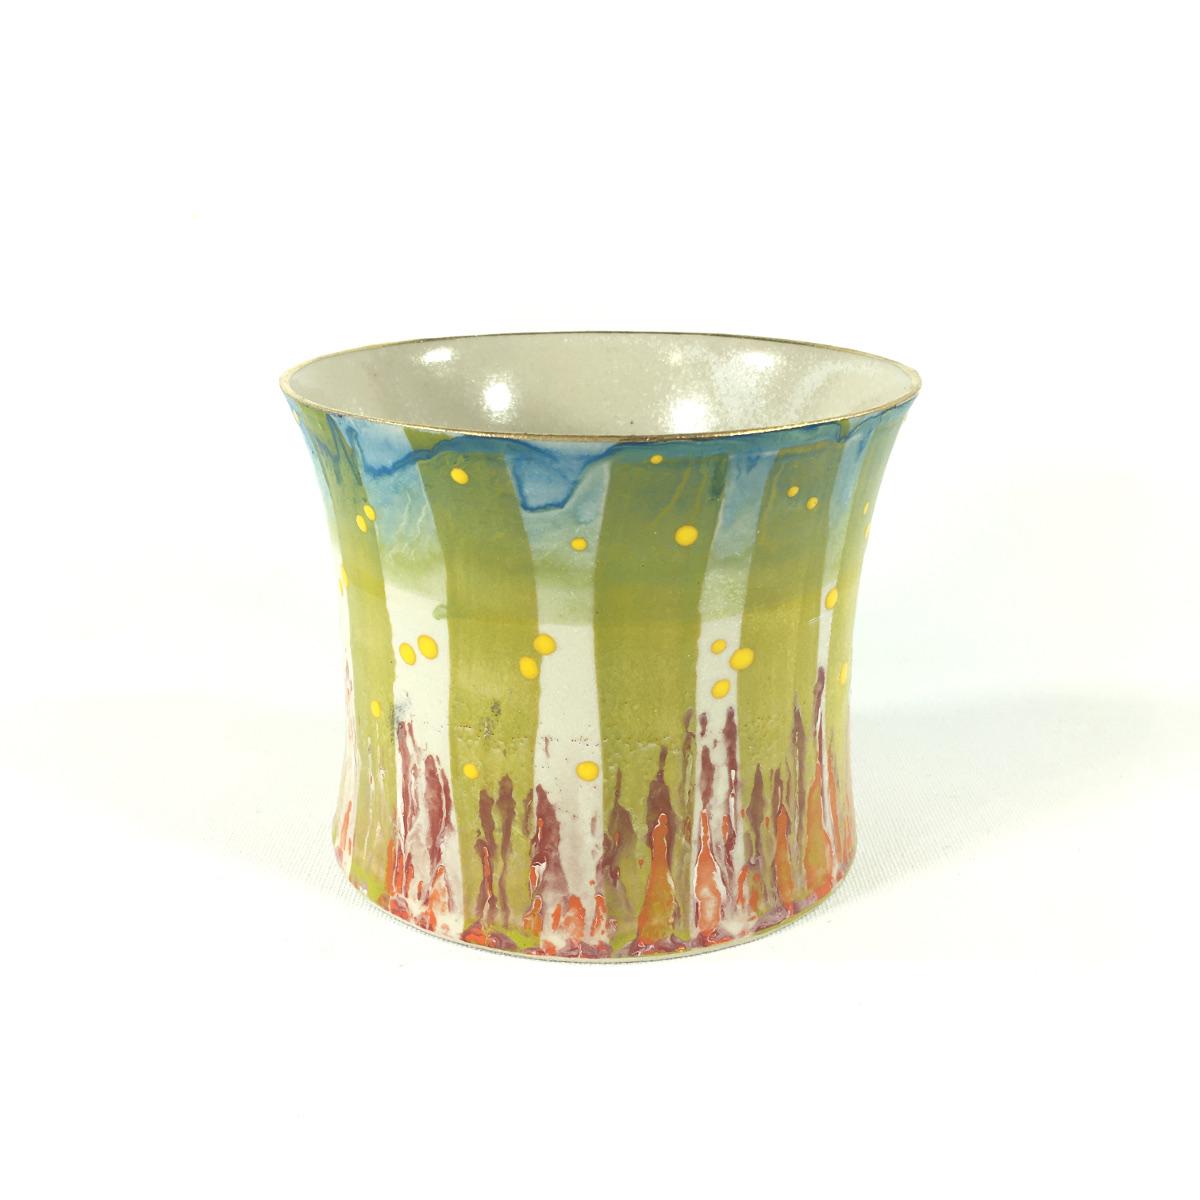 Keramikbecher Abstrakt (grün/weiß) Bild 2